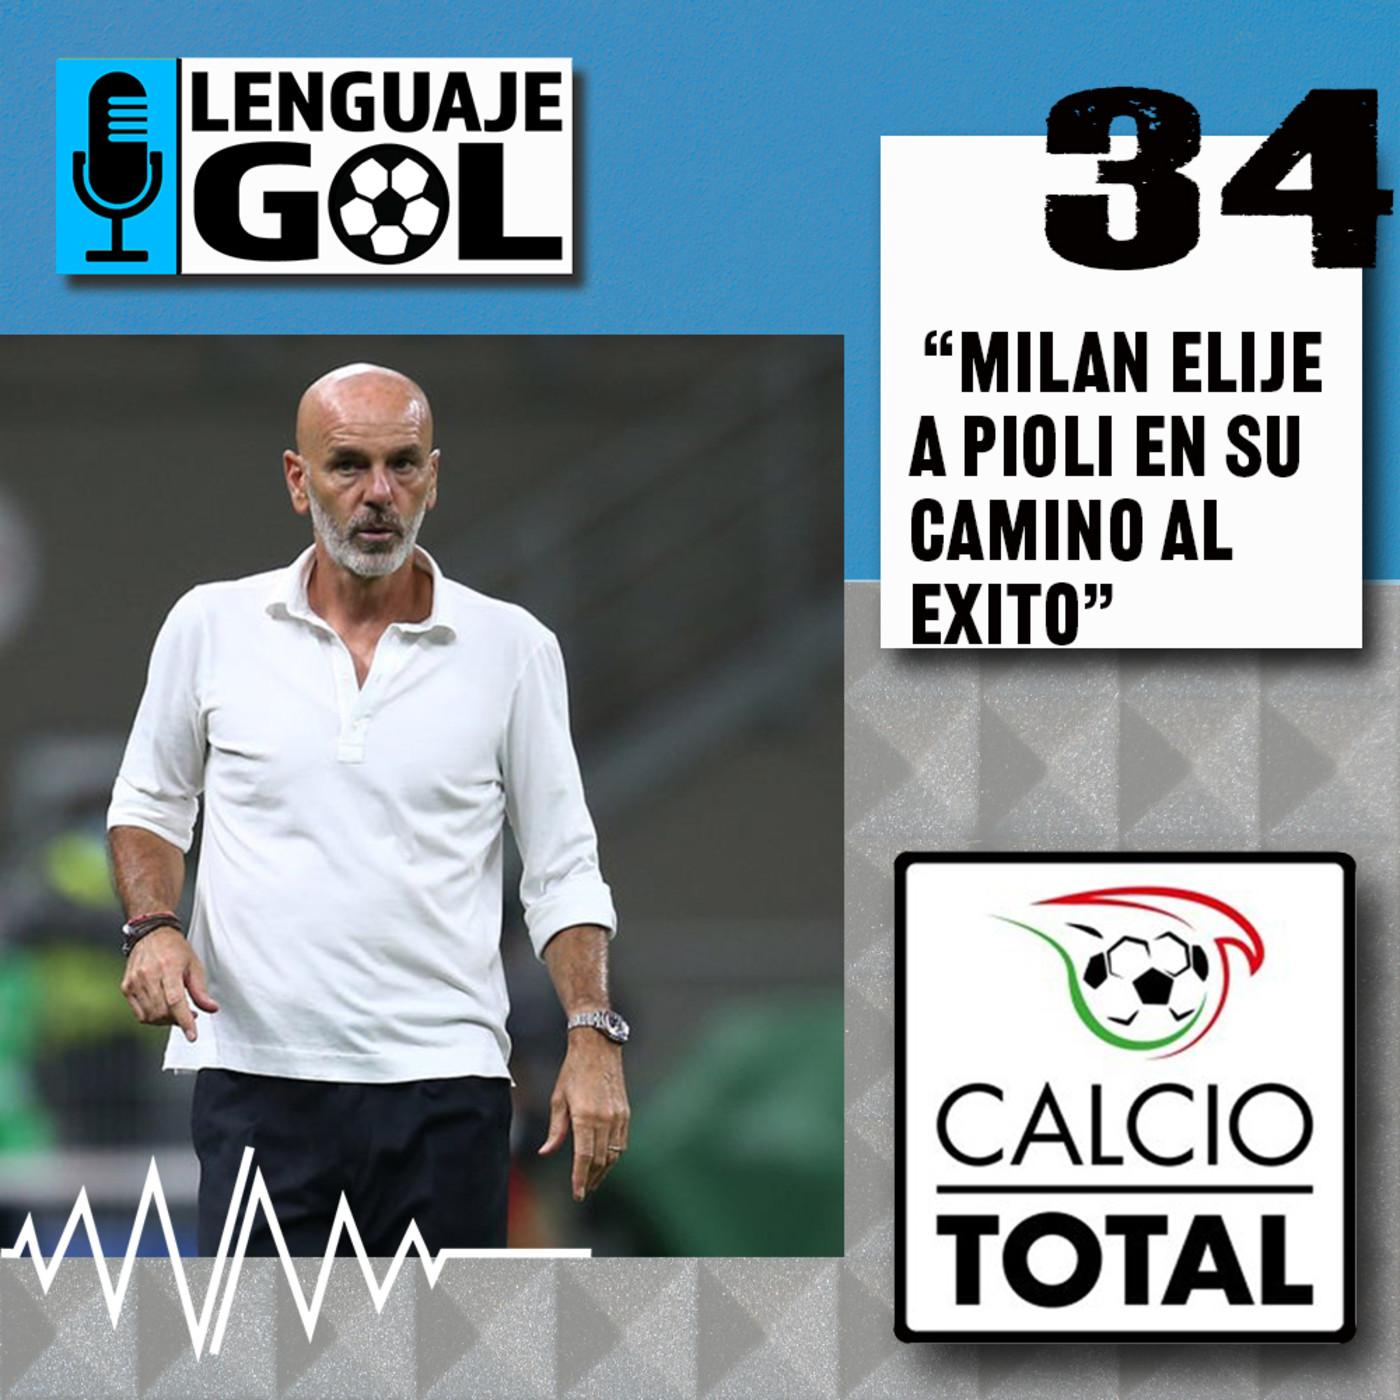 Ep. #34 CALCIO TOTAL: